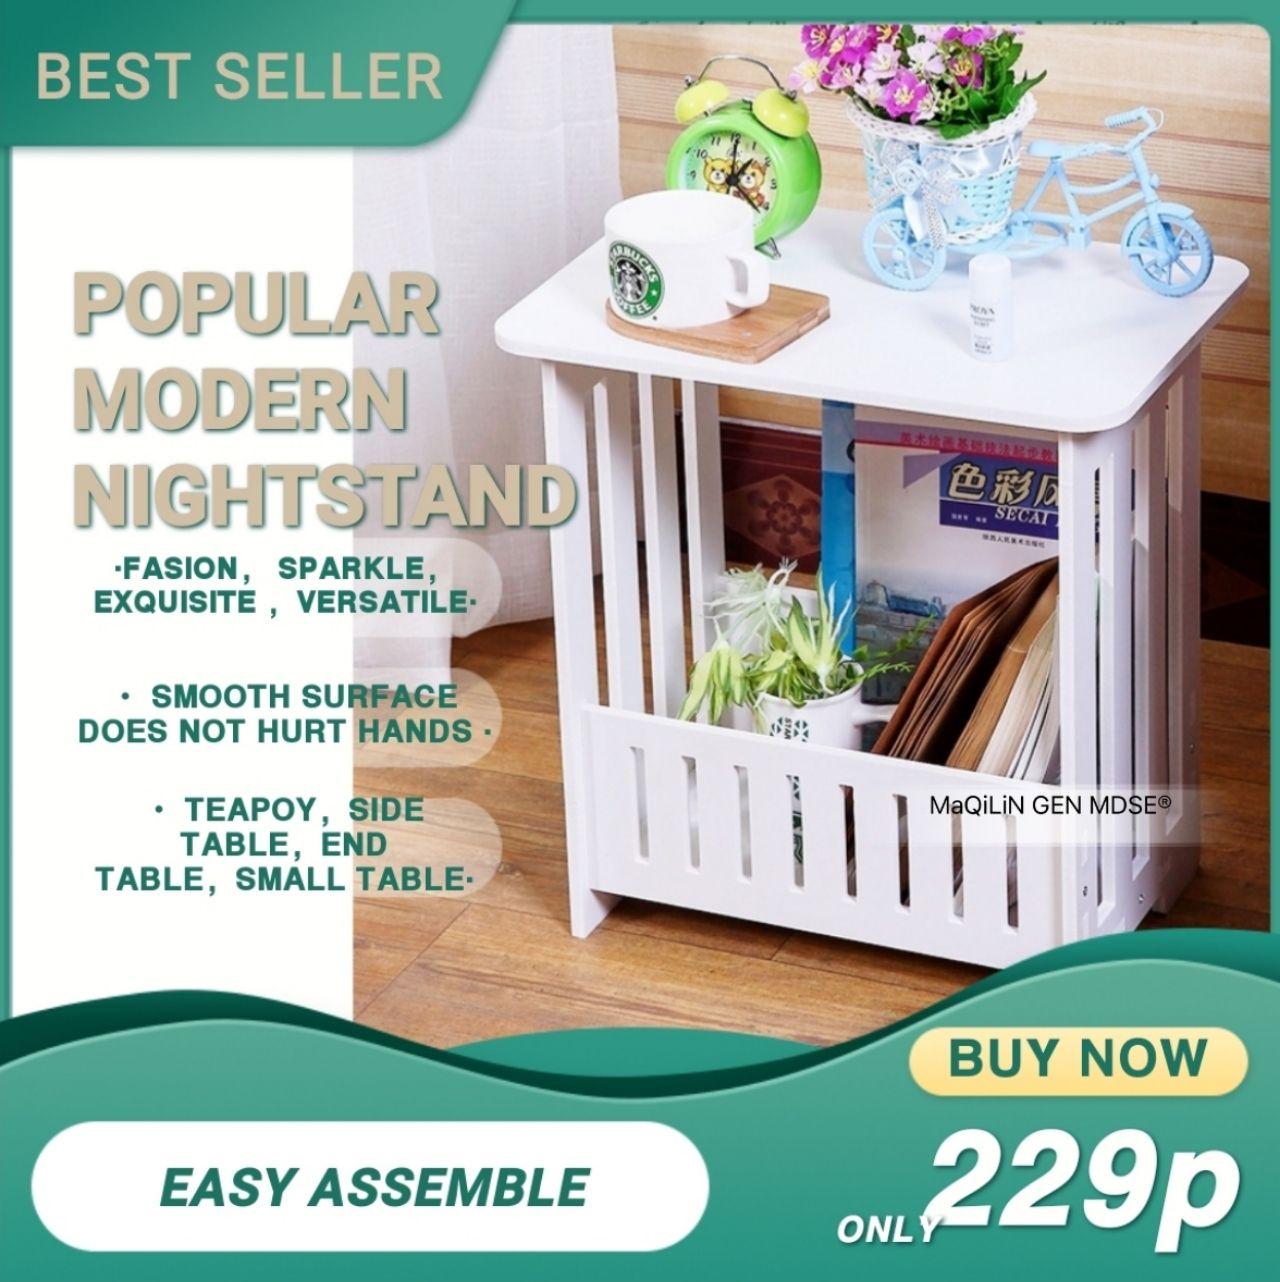 Bedside Mini Table Home Decor Nightstand Ideas Bedroom Simple Living Room Round Leisure Small Tea Table Lazada Ph